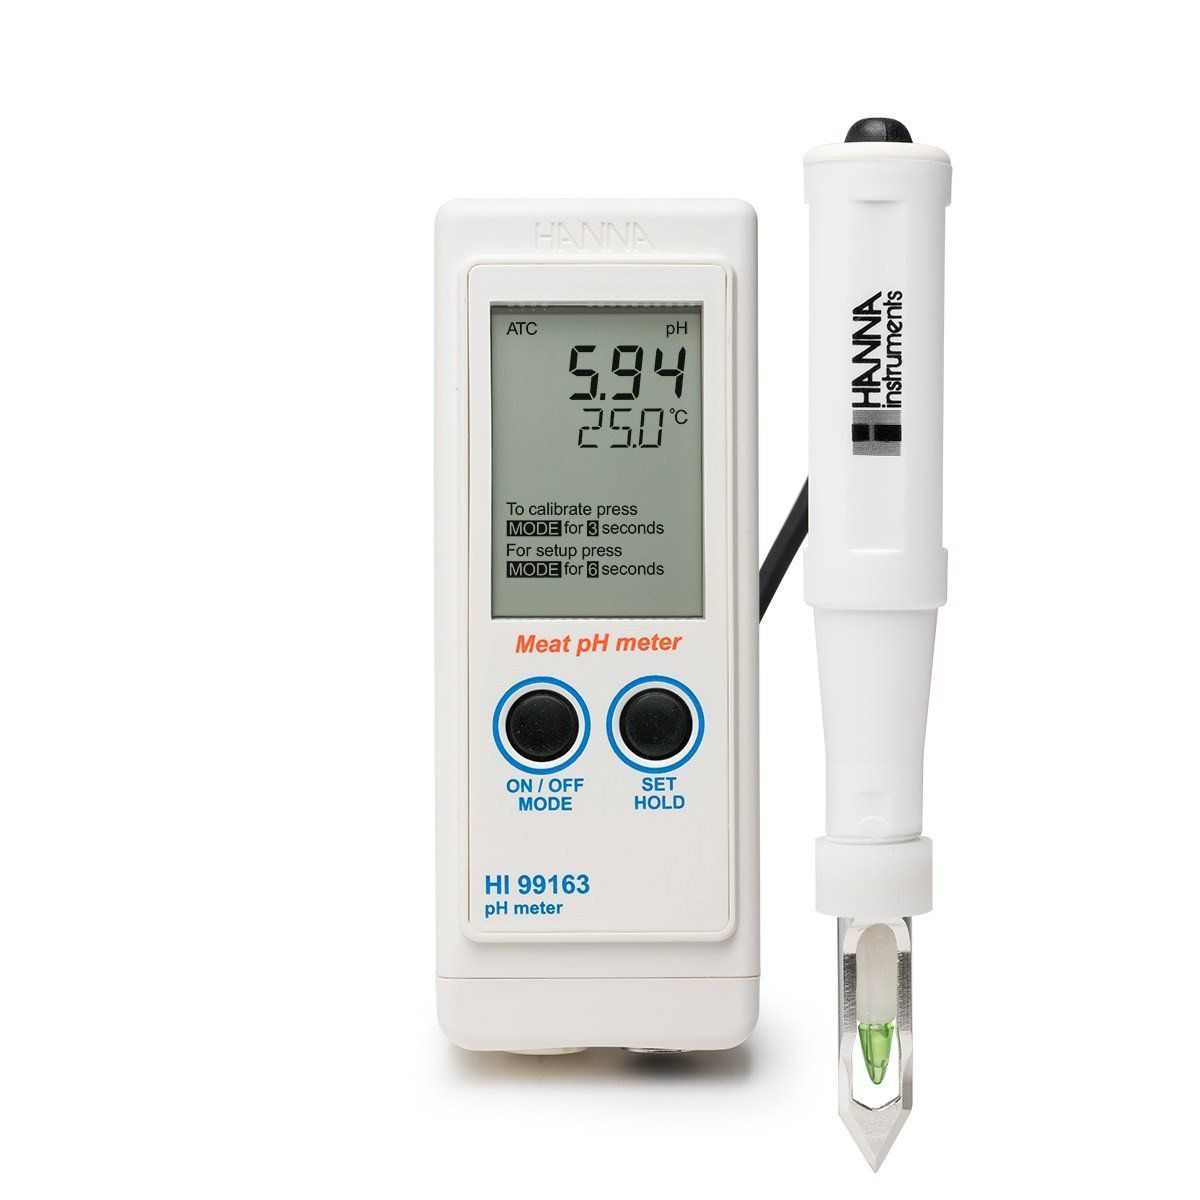 Medidor Portátil de pH e Temperatura para Carne Hanna